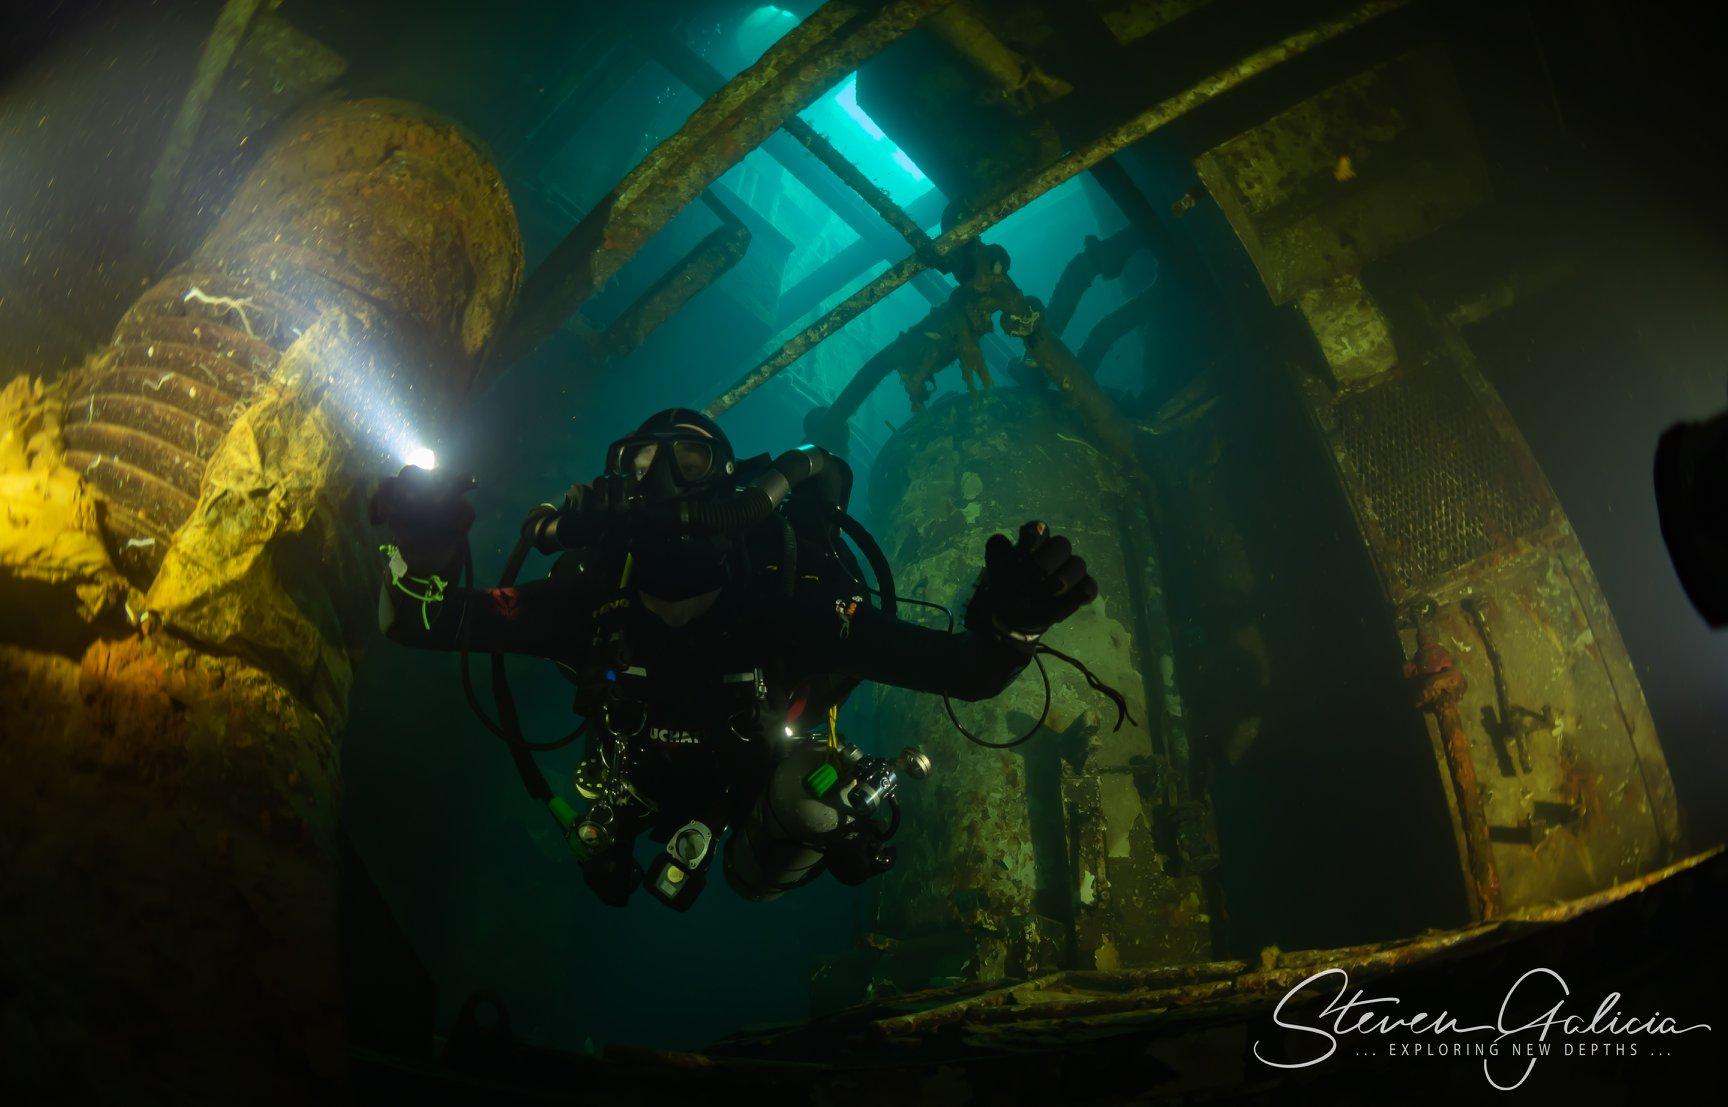 Engine room [Steven Galicia]